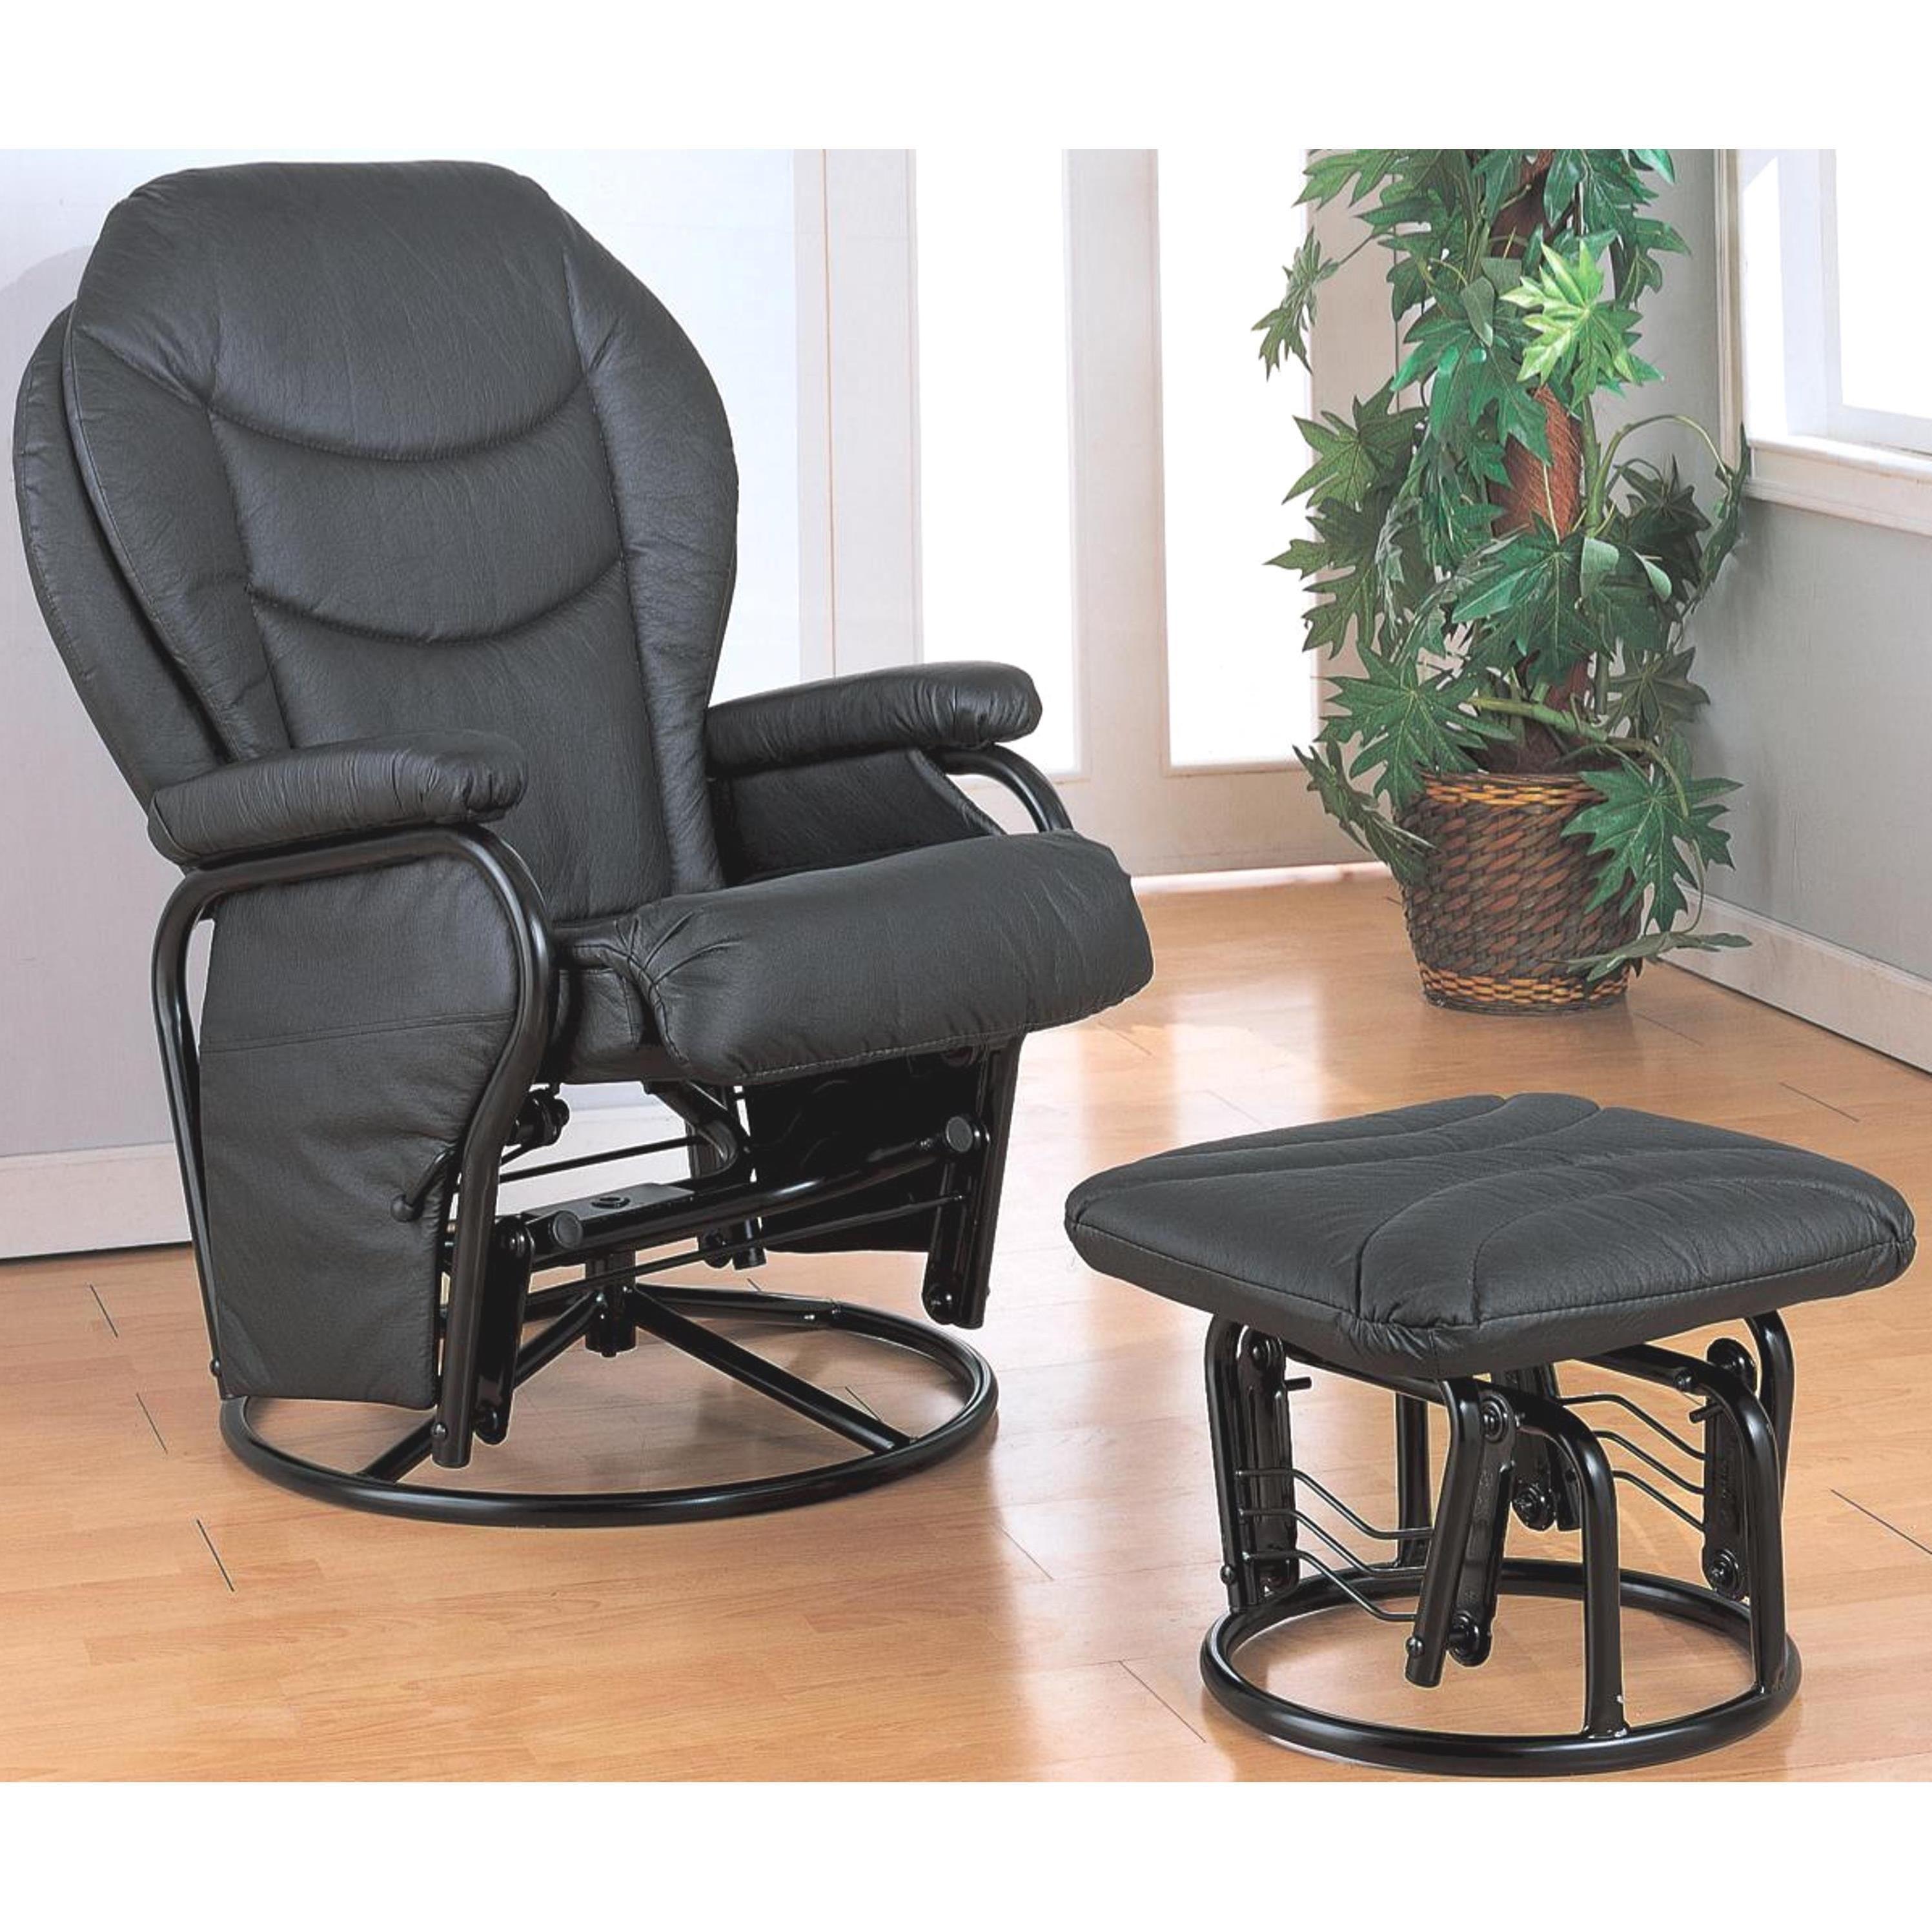 Enjoyable Ollius Swivel Glider Recliner Ottoman Set In 2019 Home Ibusinesslaw Wood Chair Design Ideas Ibusinesslaworg